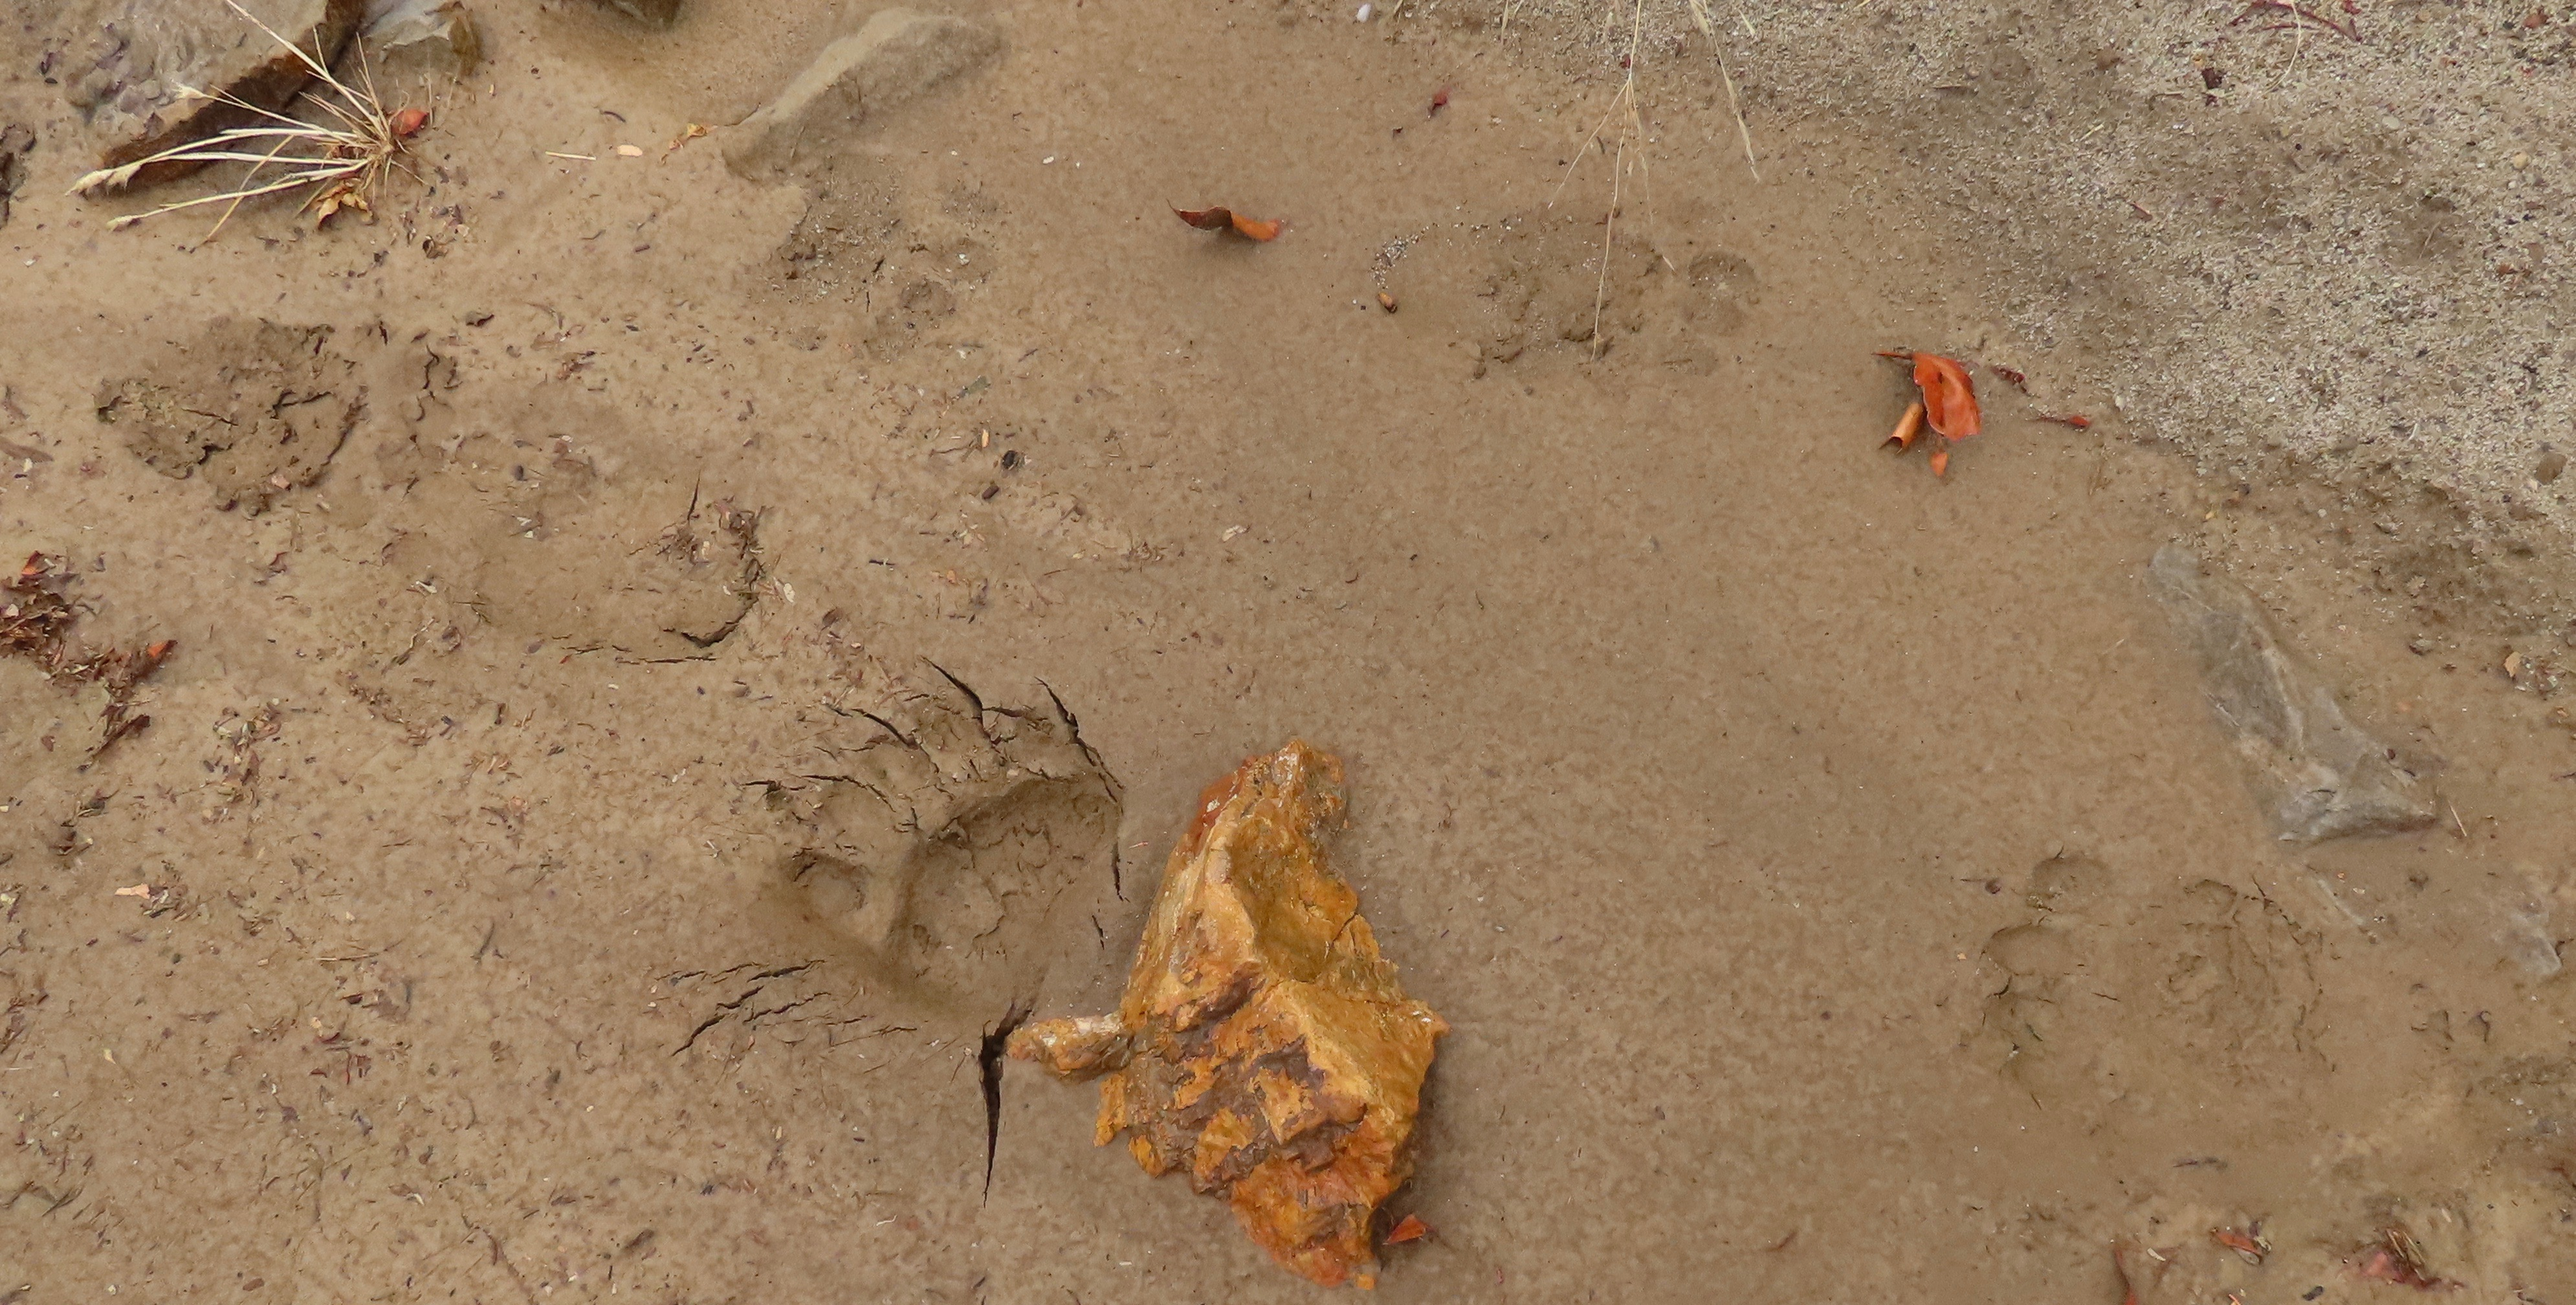 Bear tracks agua blanca creek sespe wilderness los padres national forest